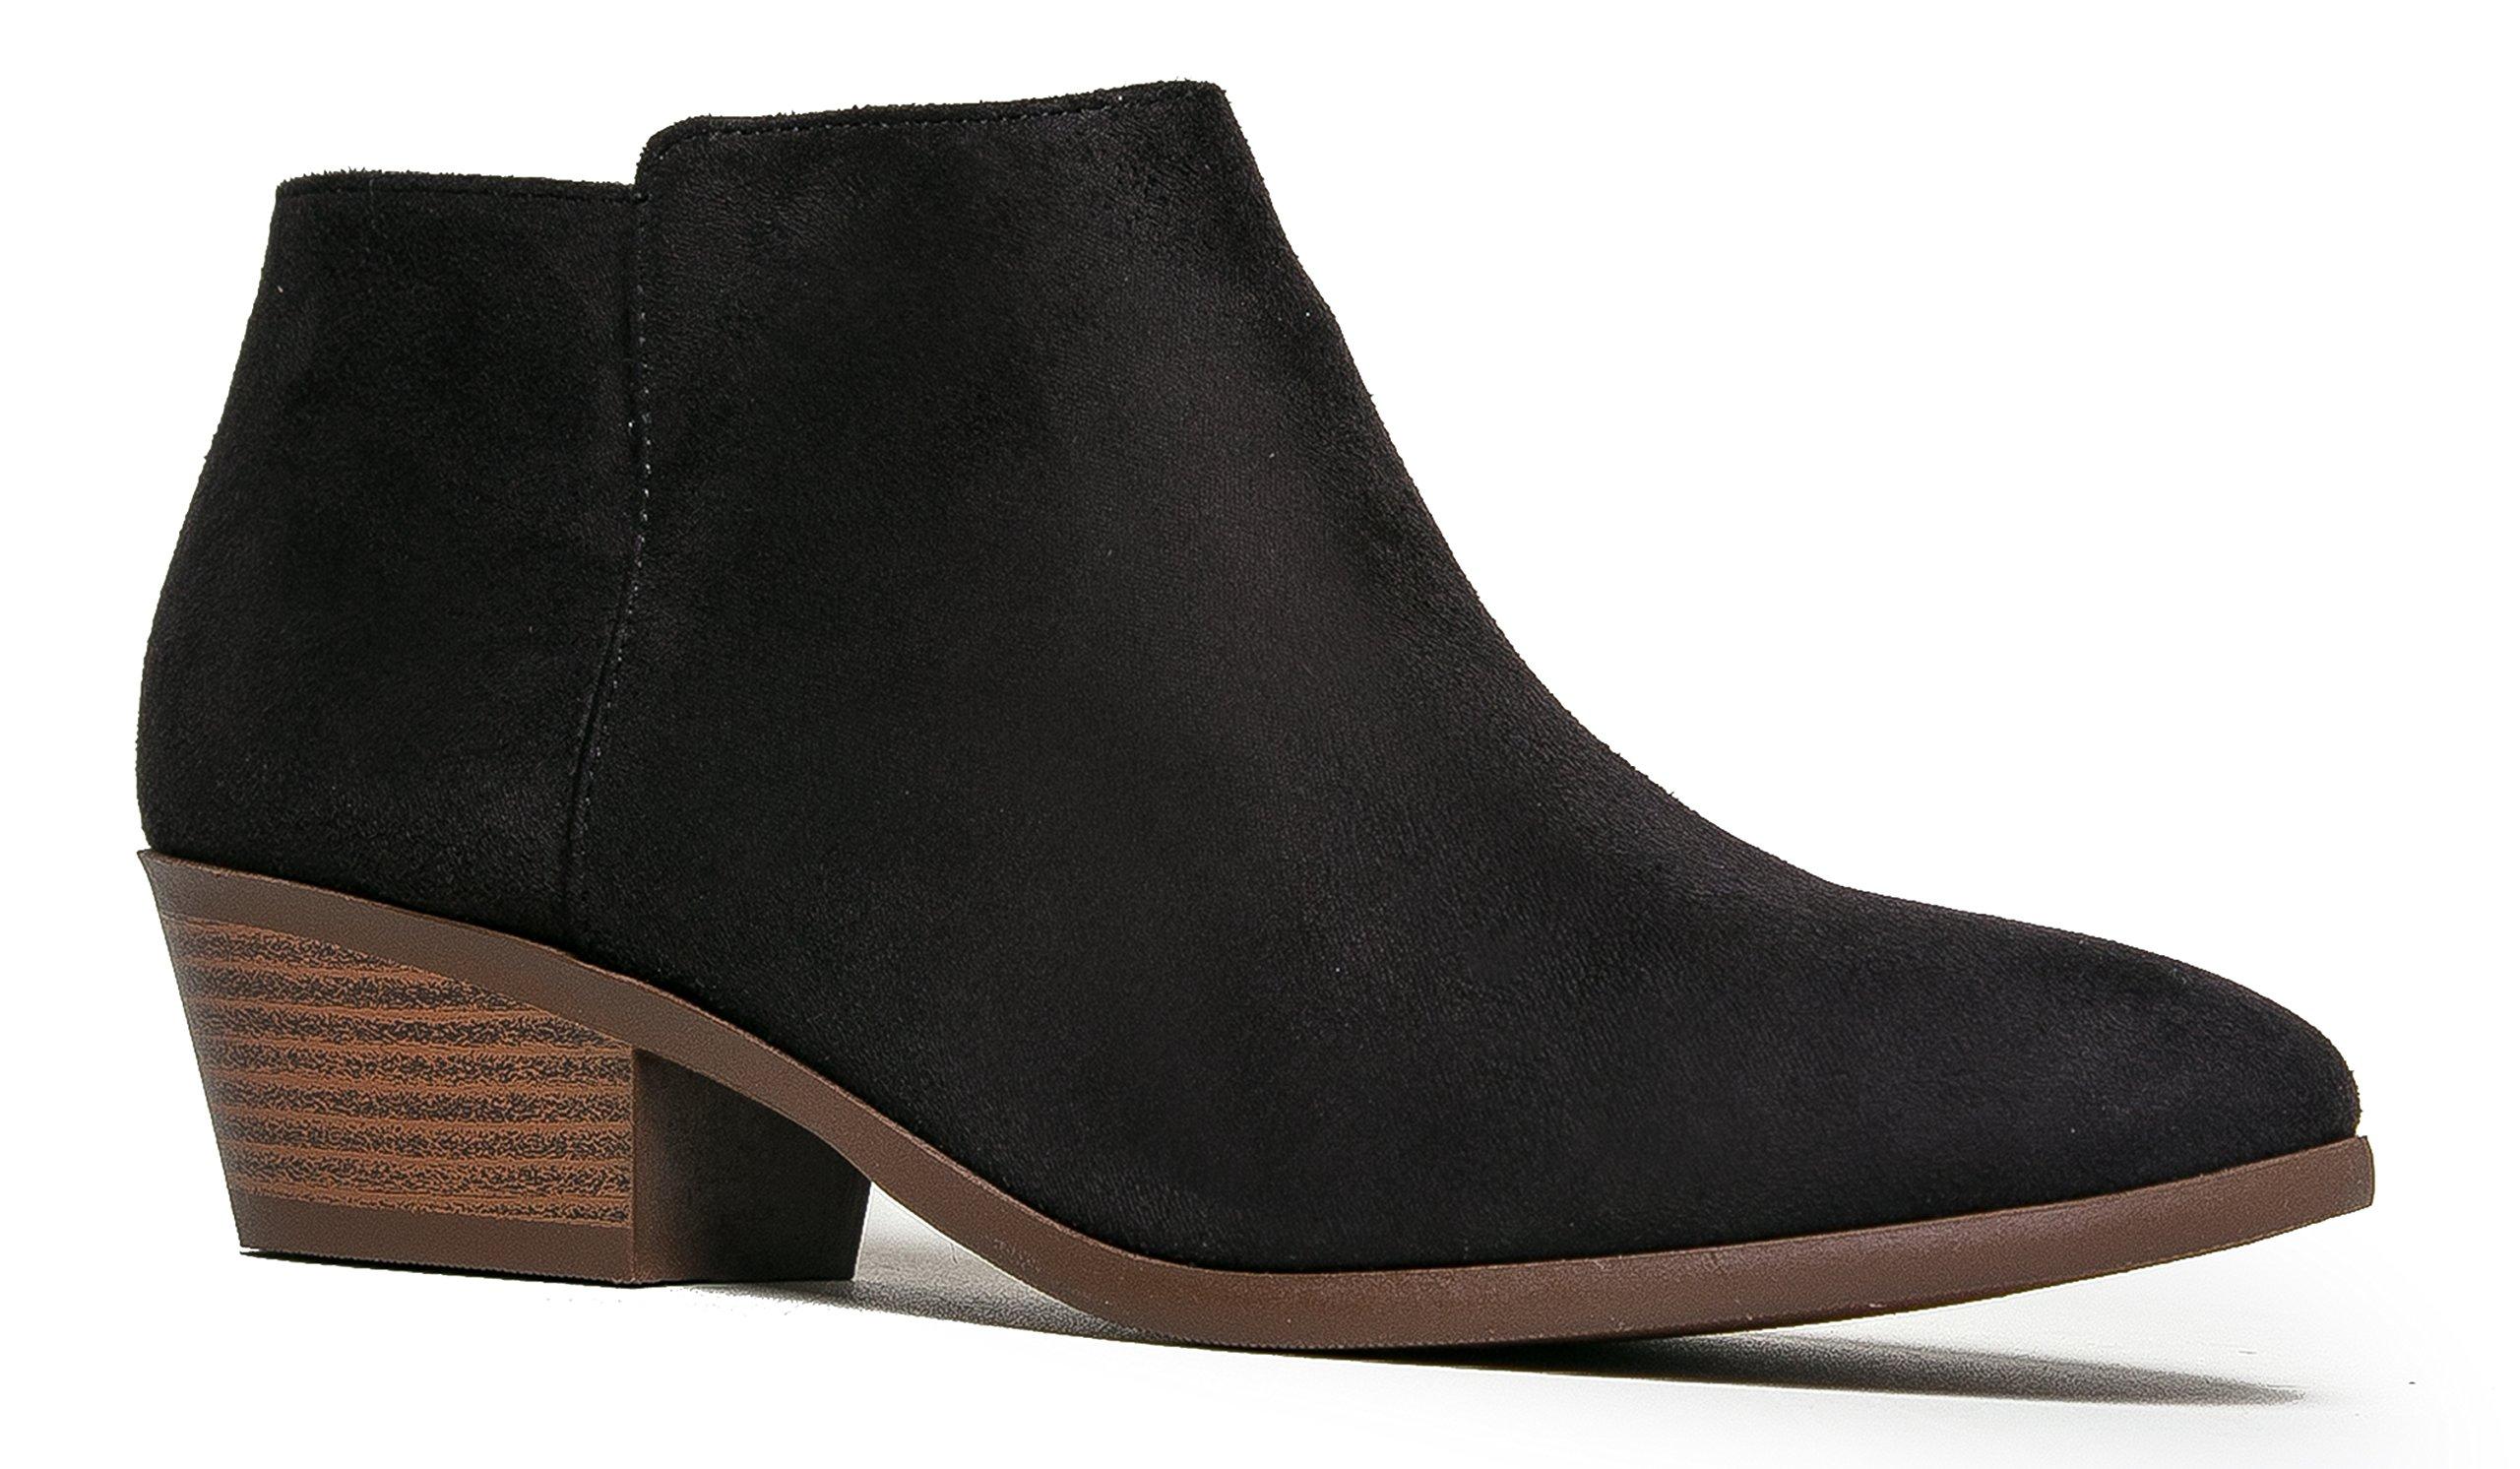 J. Adams Women's Black Suede  Low Heel Western Ankle Bootie - 7.5 B(M) US